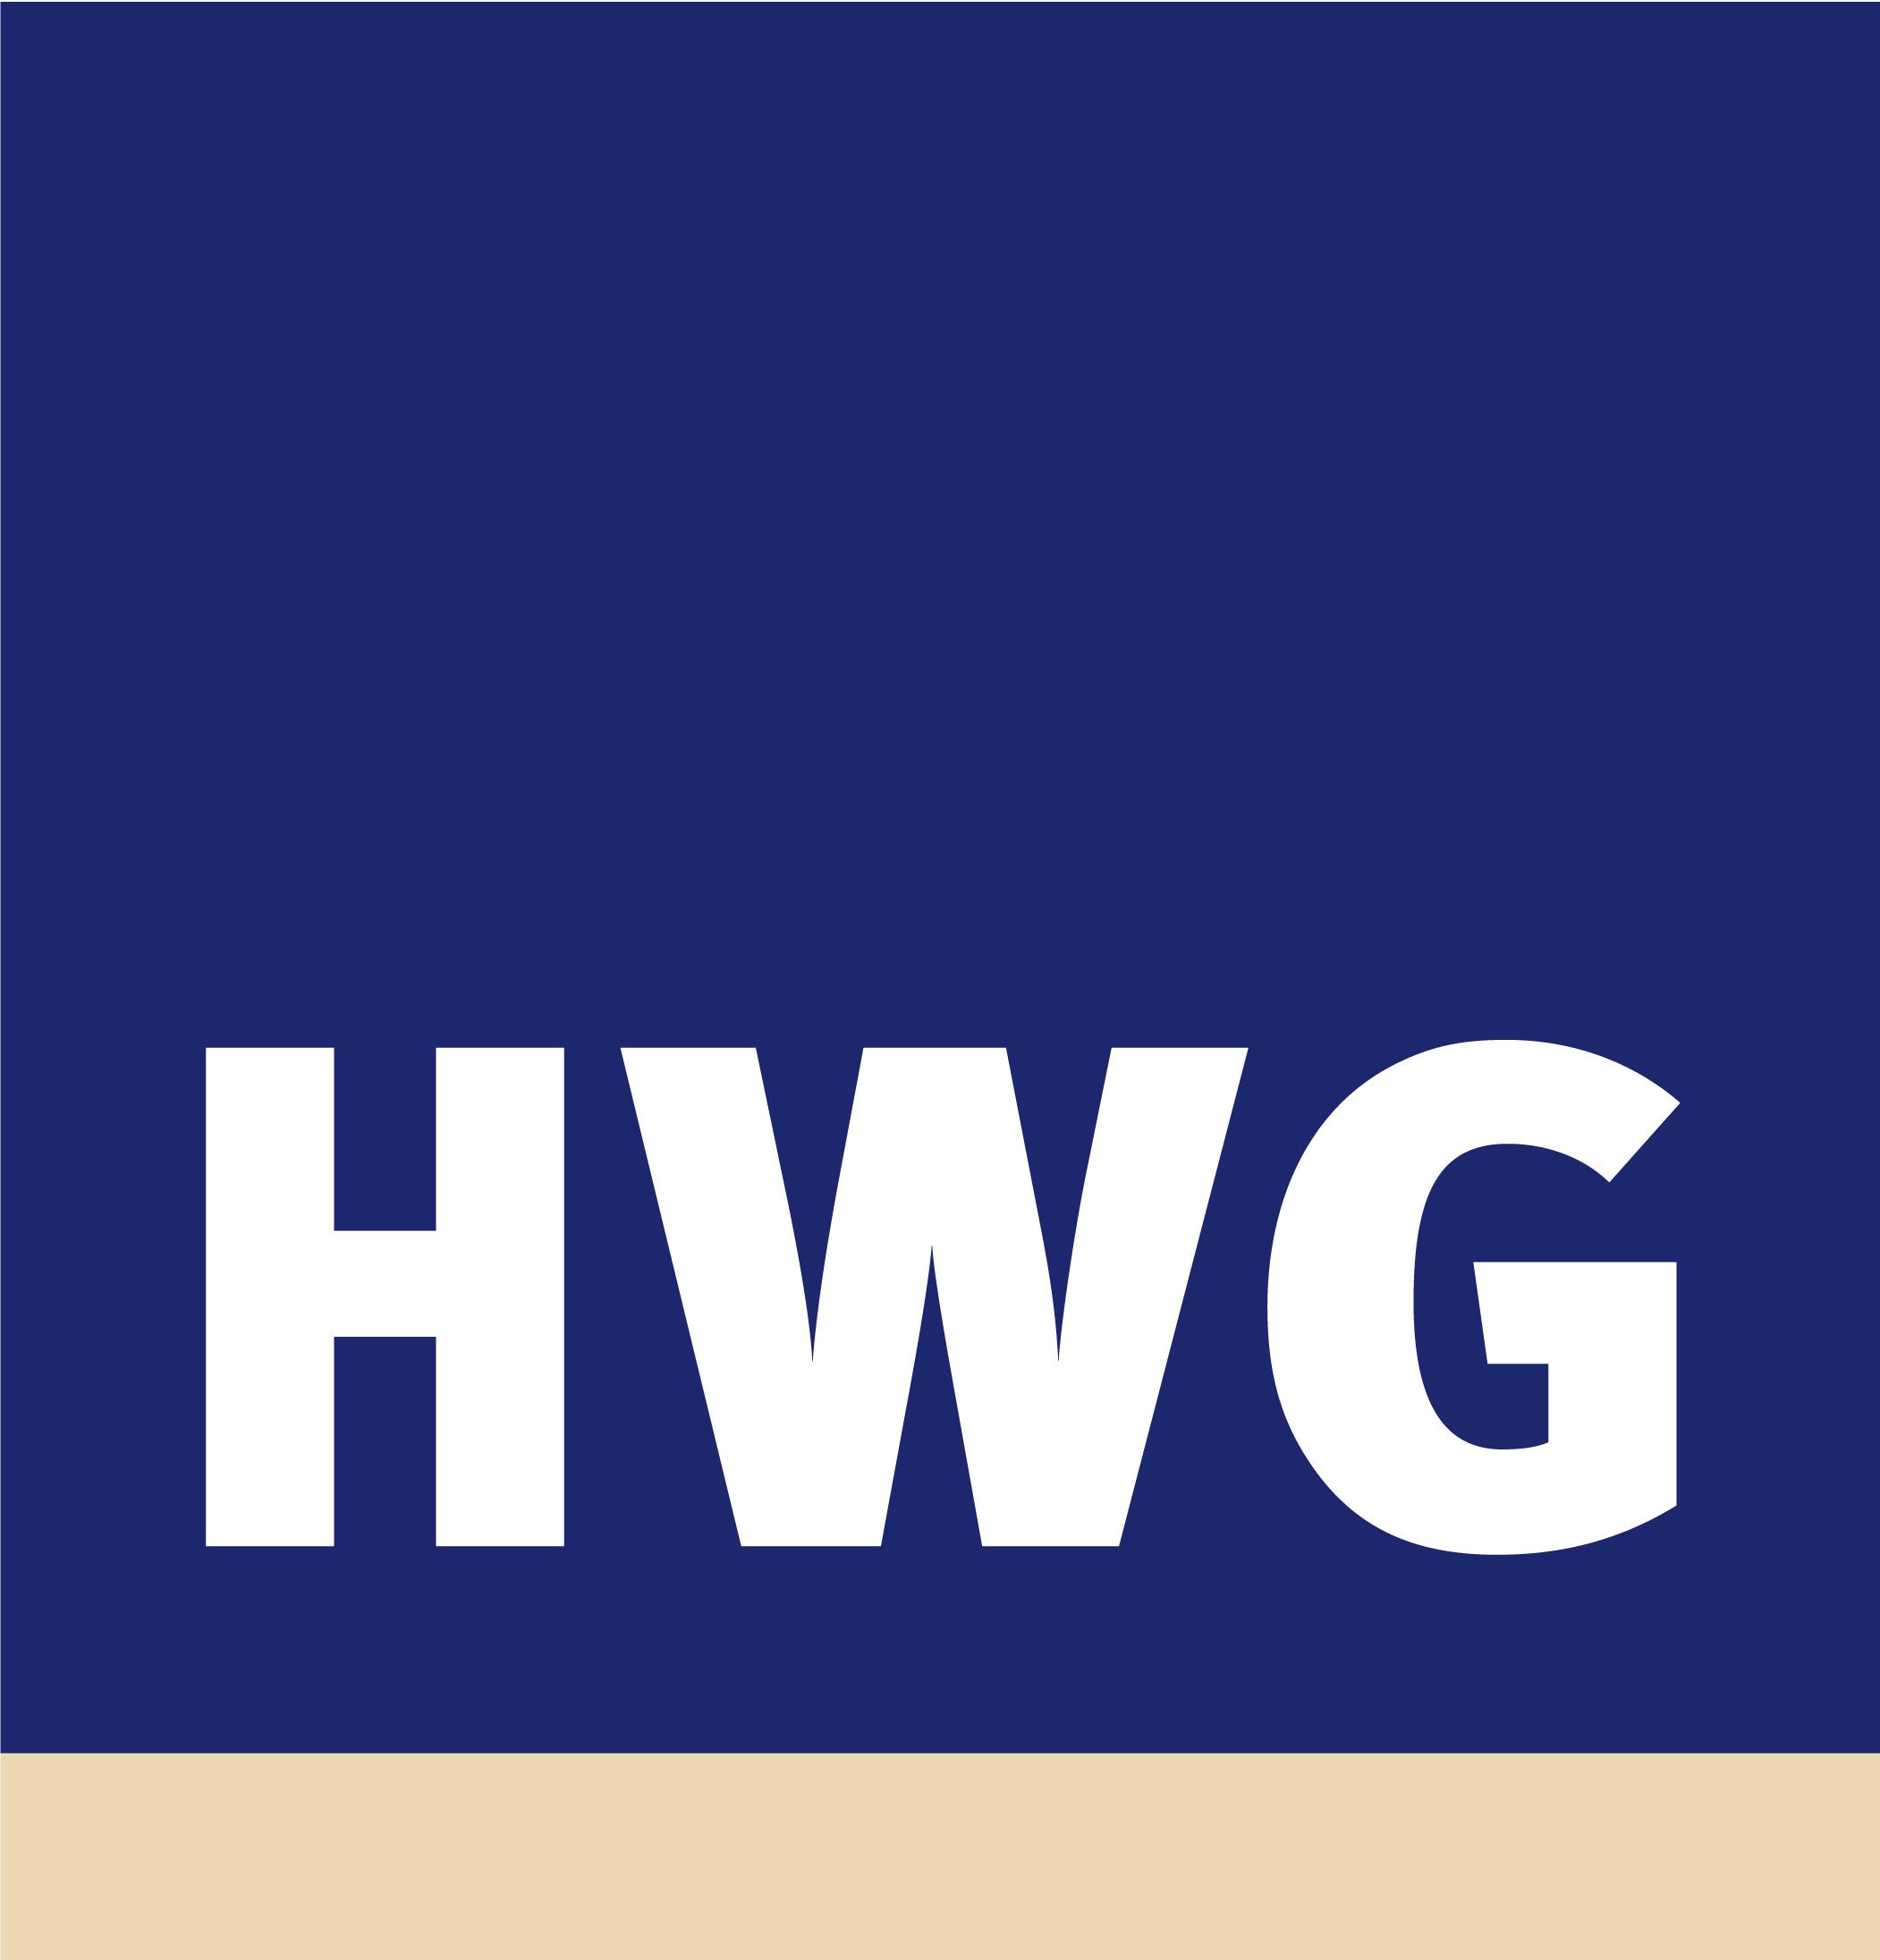 HWG mbH